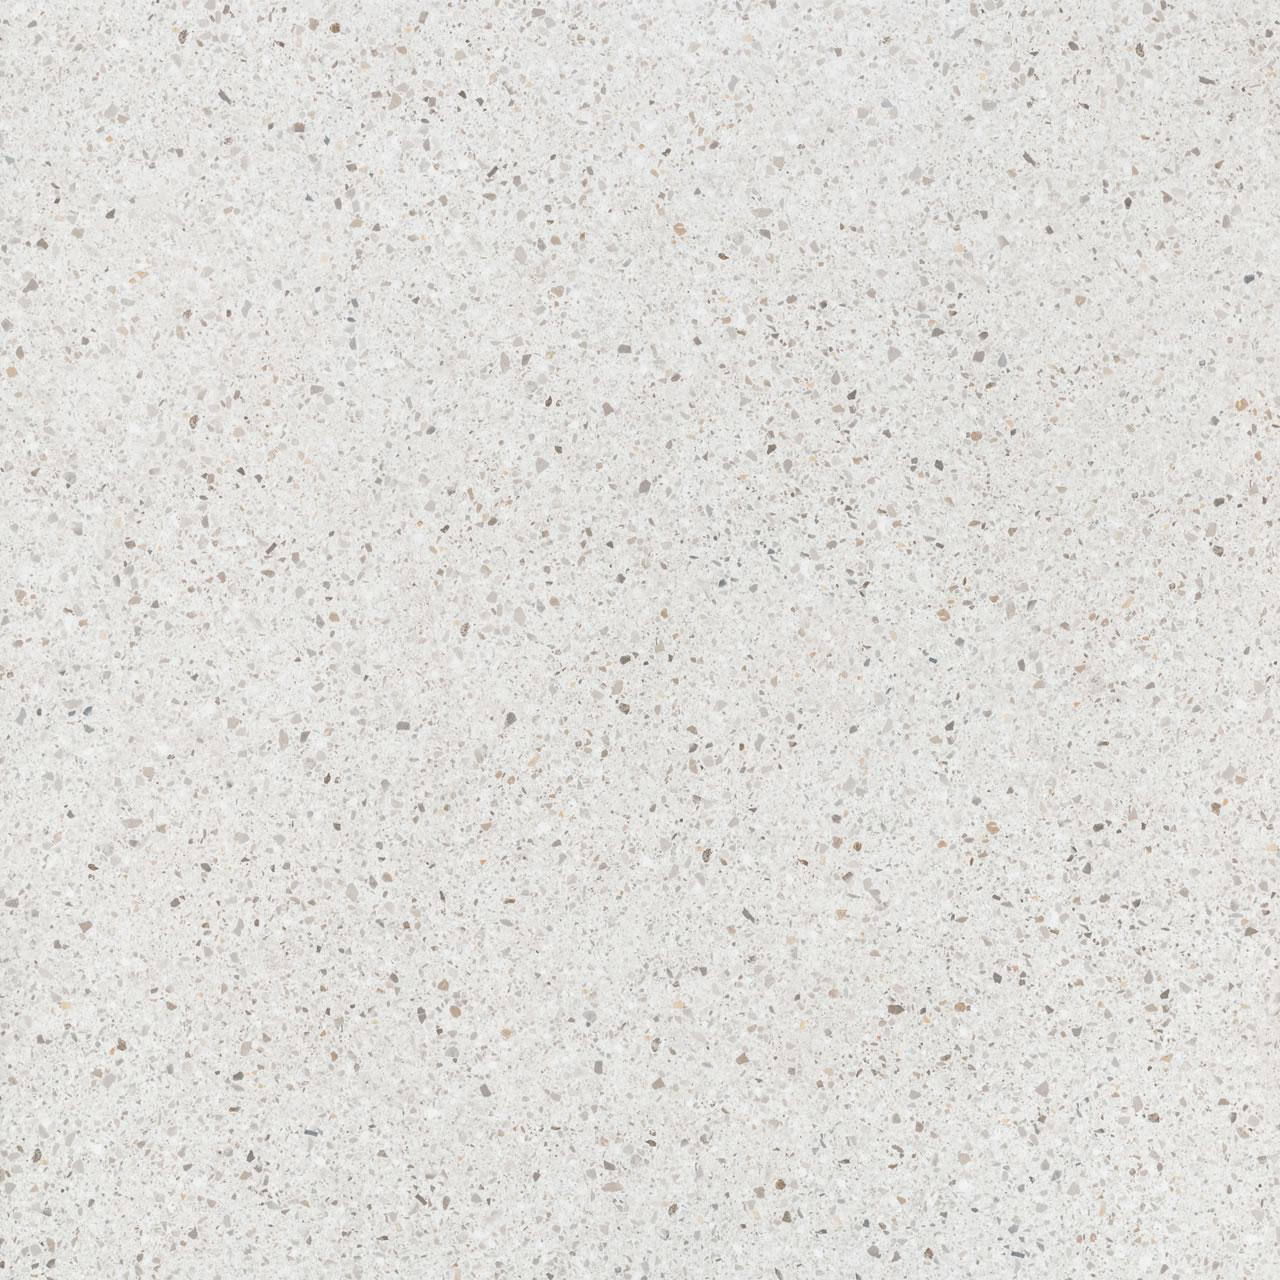 Столешница ЛДСП 38 мм для кухни белый мрамор